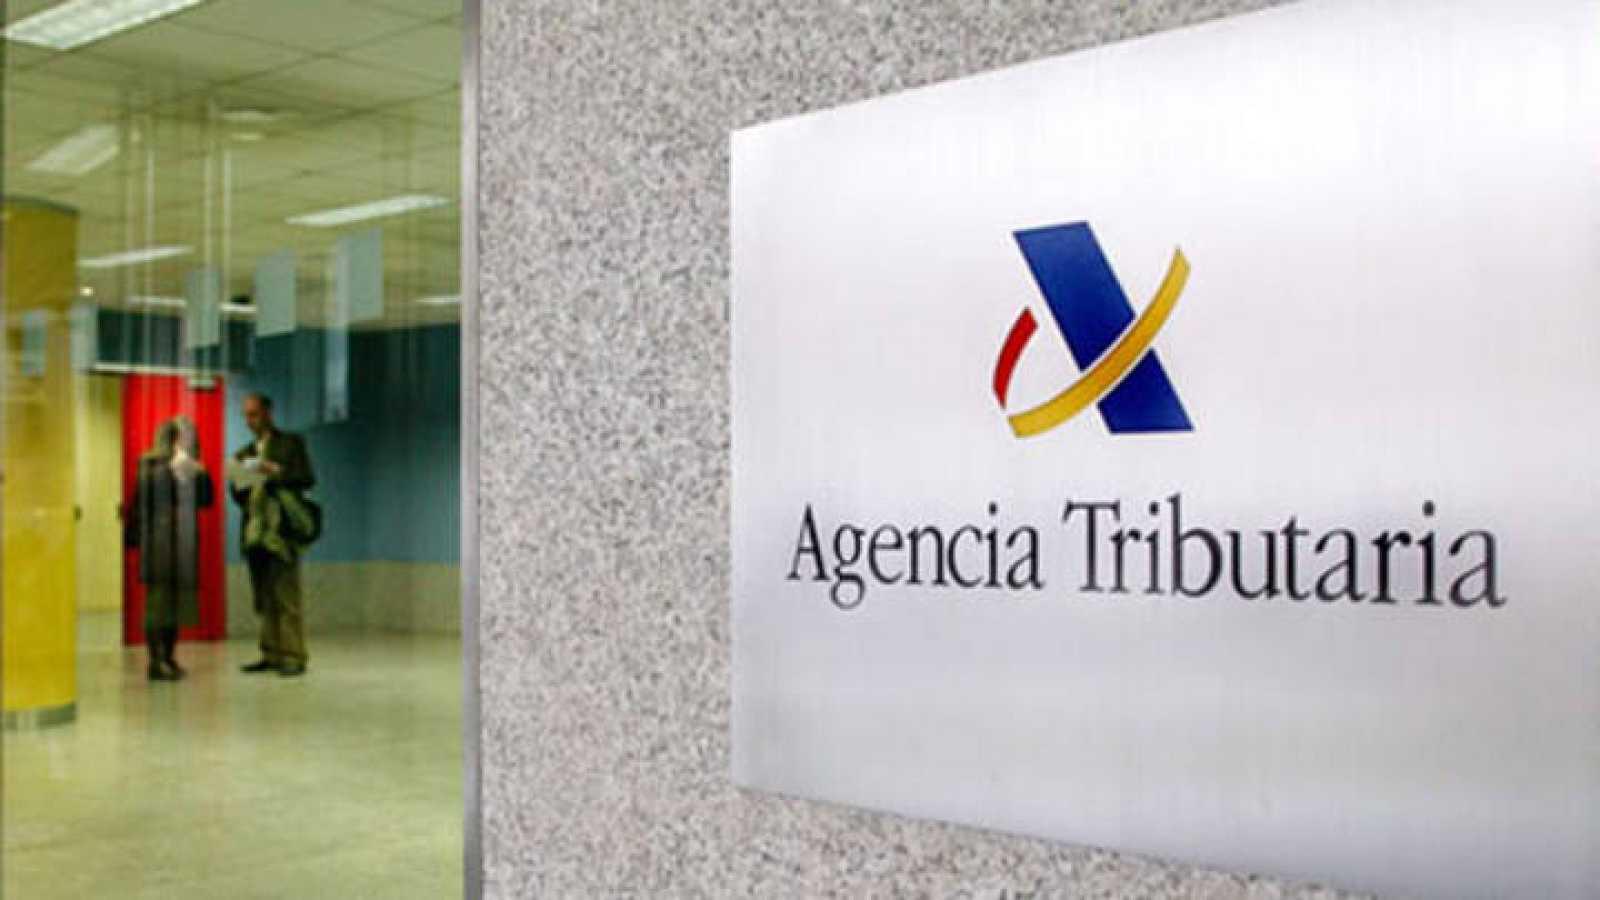 Logotipo de la Agencia Tributaria